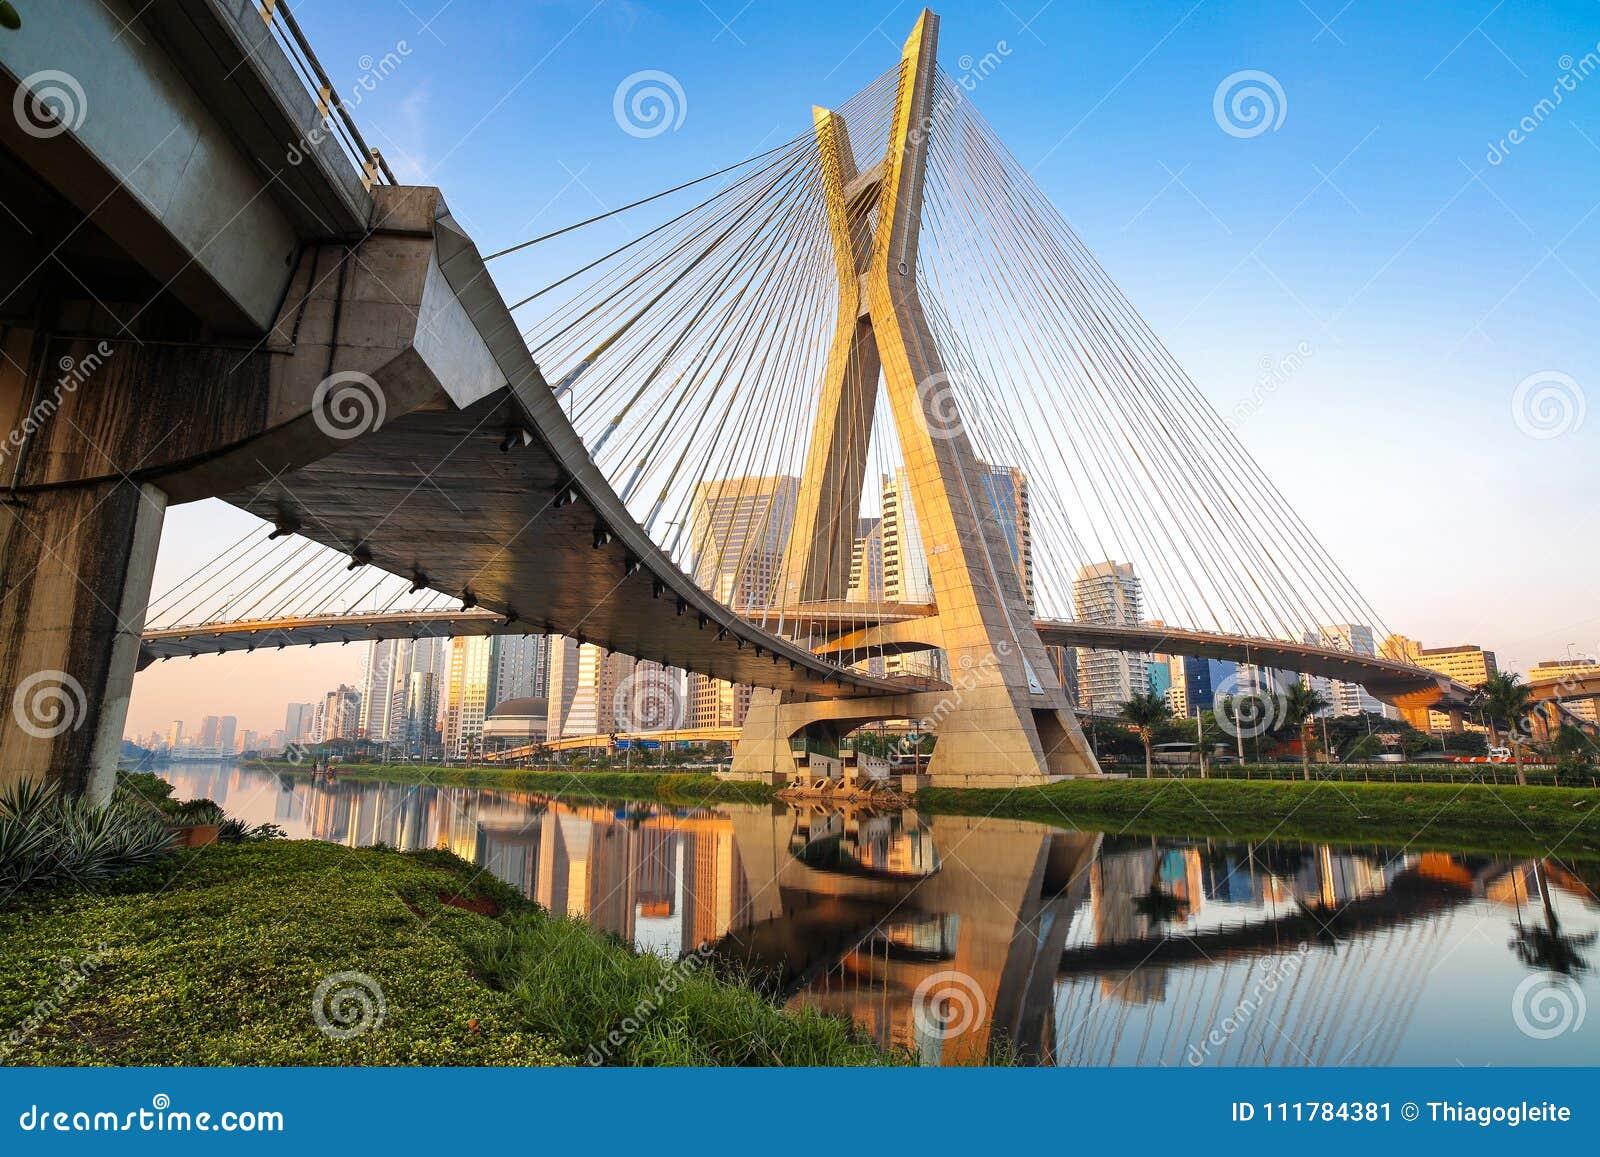 Estaiada-Brücke - Sao Paulo - Brasilien